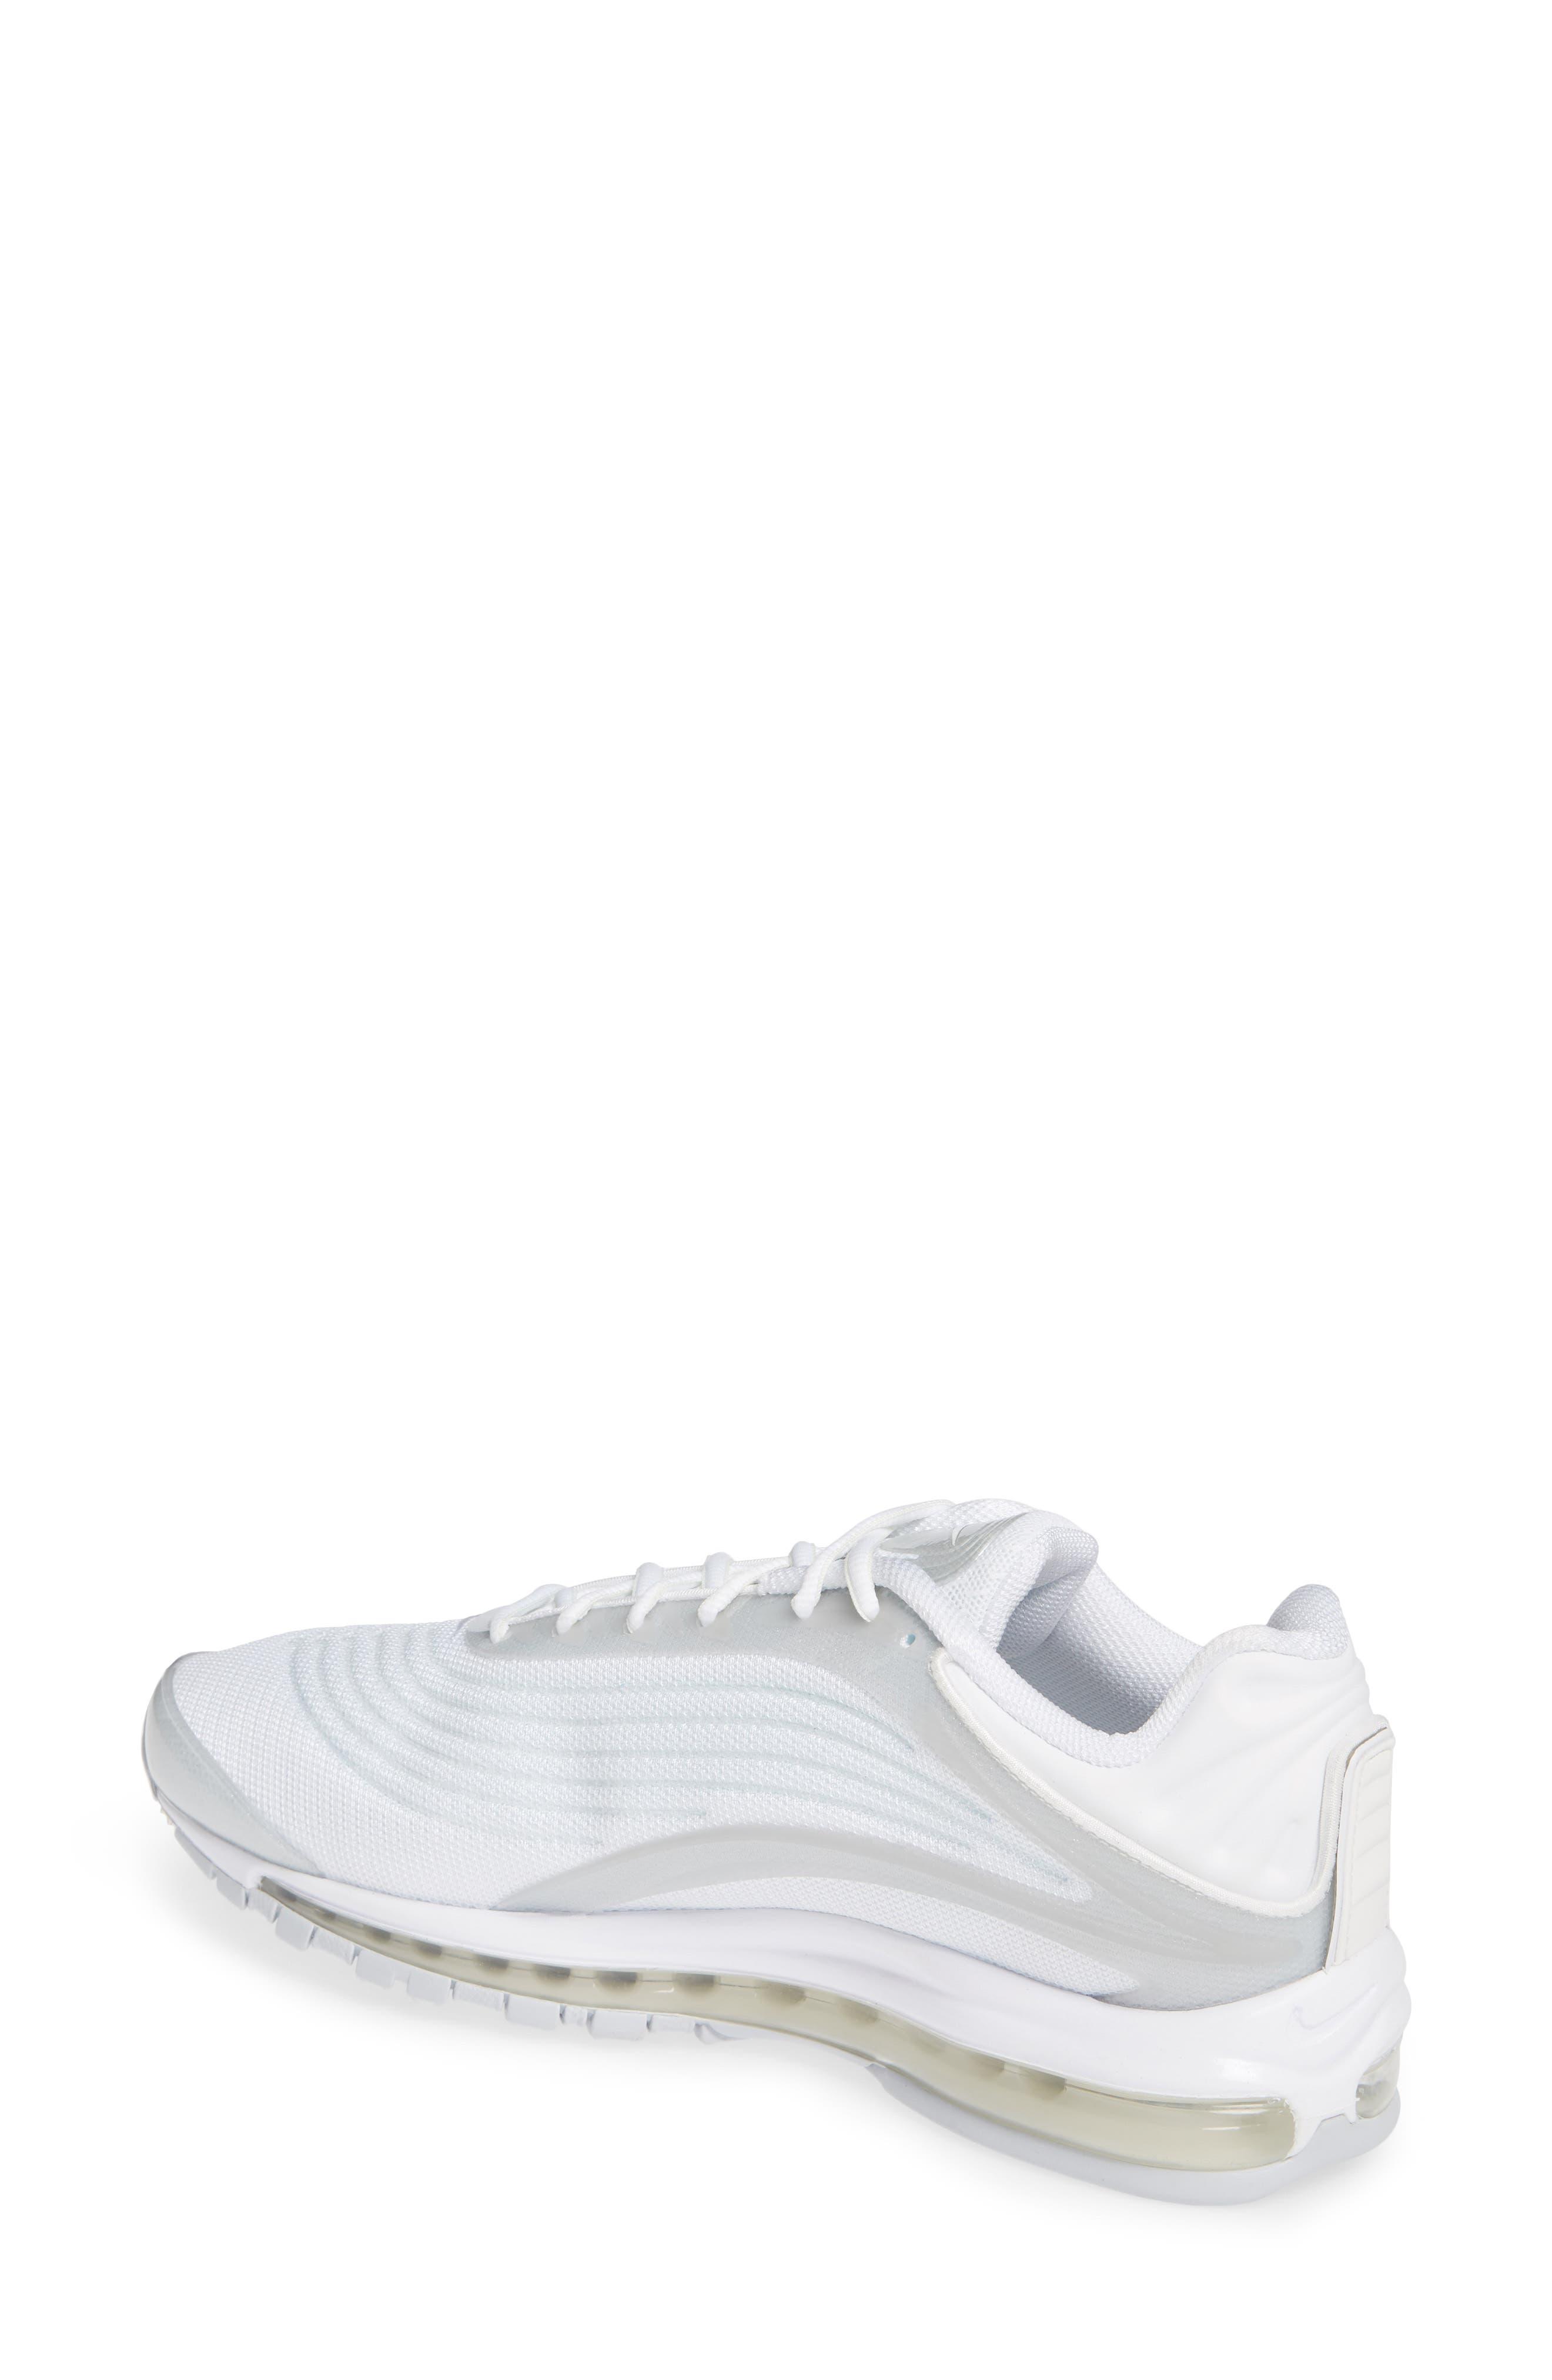 NIKE,                             Air Max Deluxe Sneaker,                             Alternate thumbnail 2, color,                             WHITE/ SAIL/ PURE PLATINUM